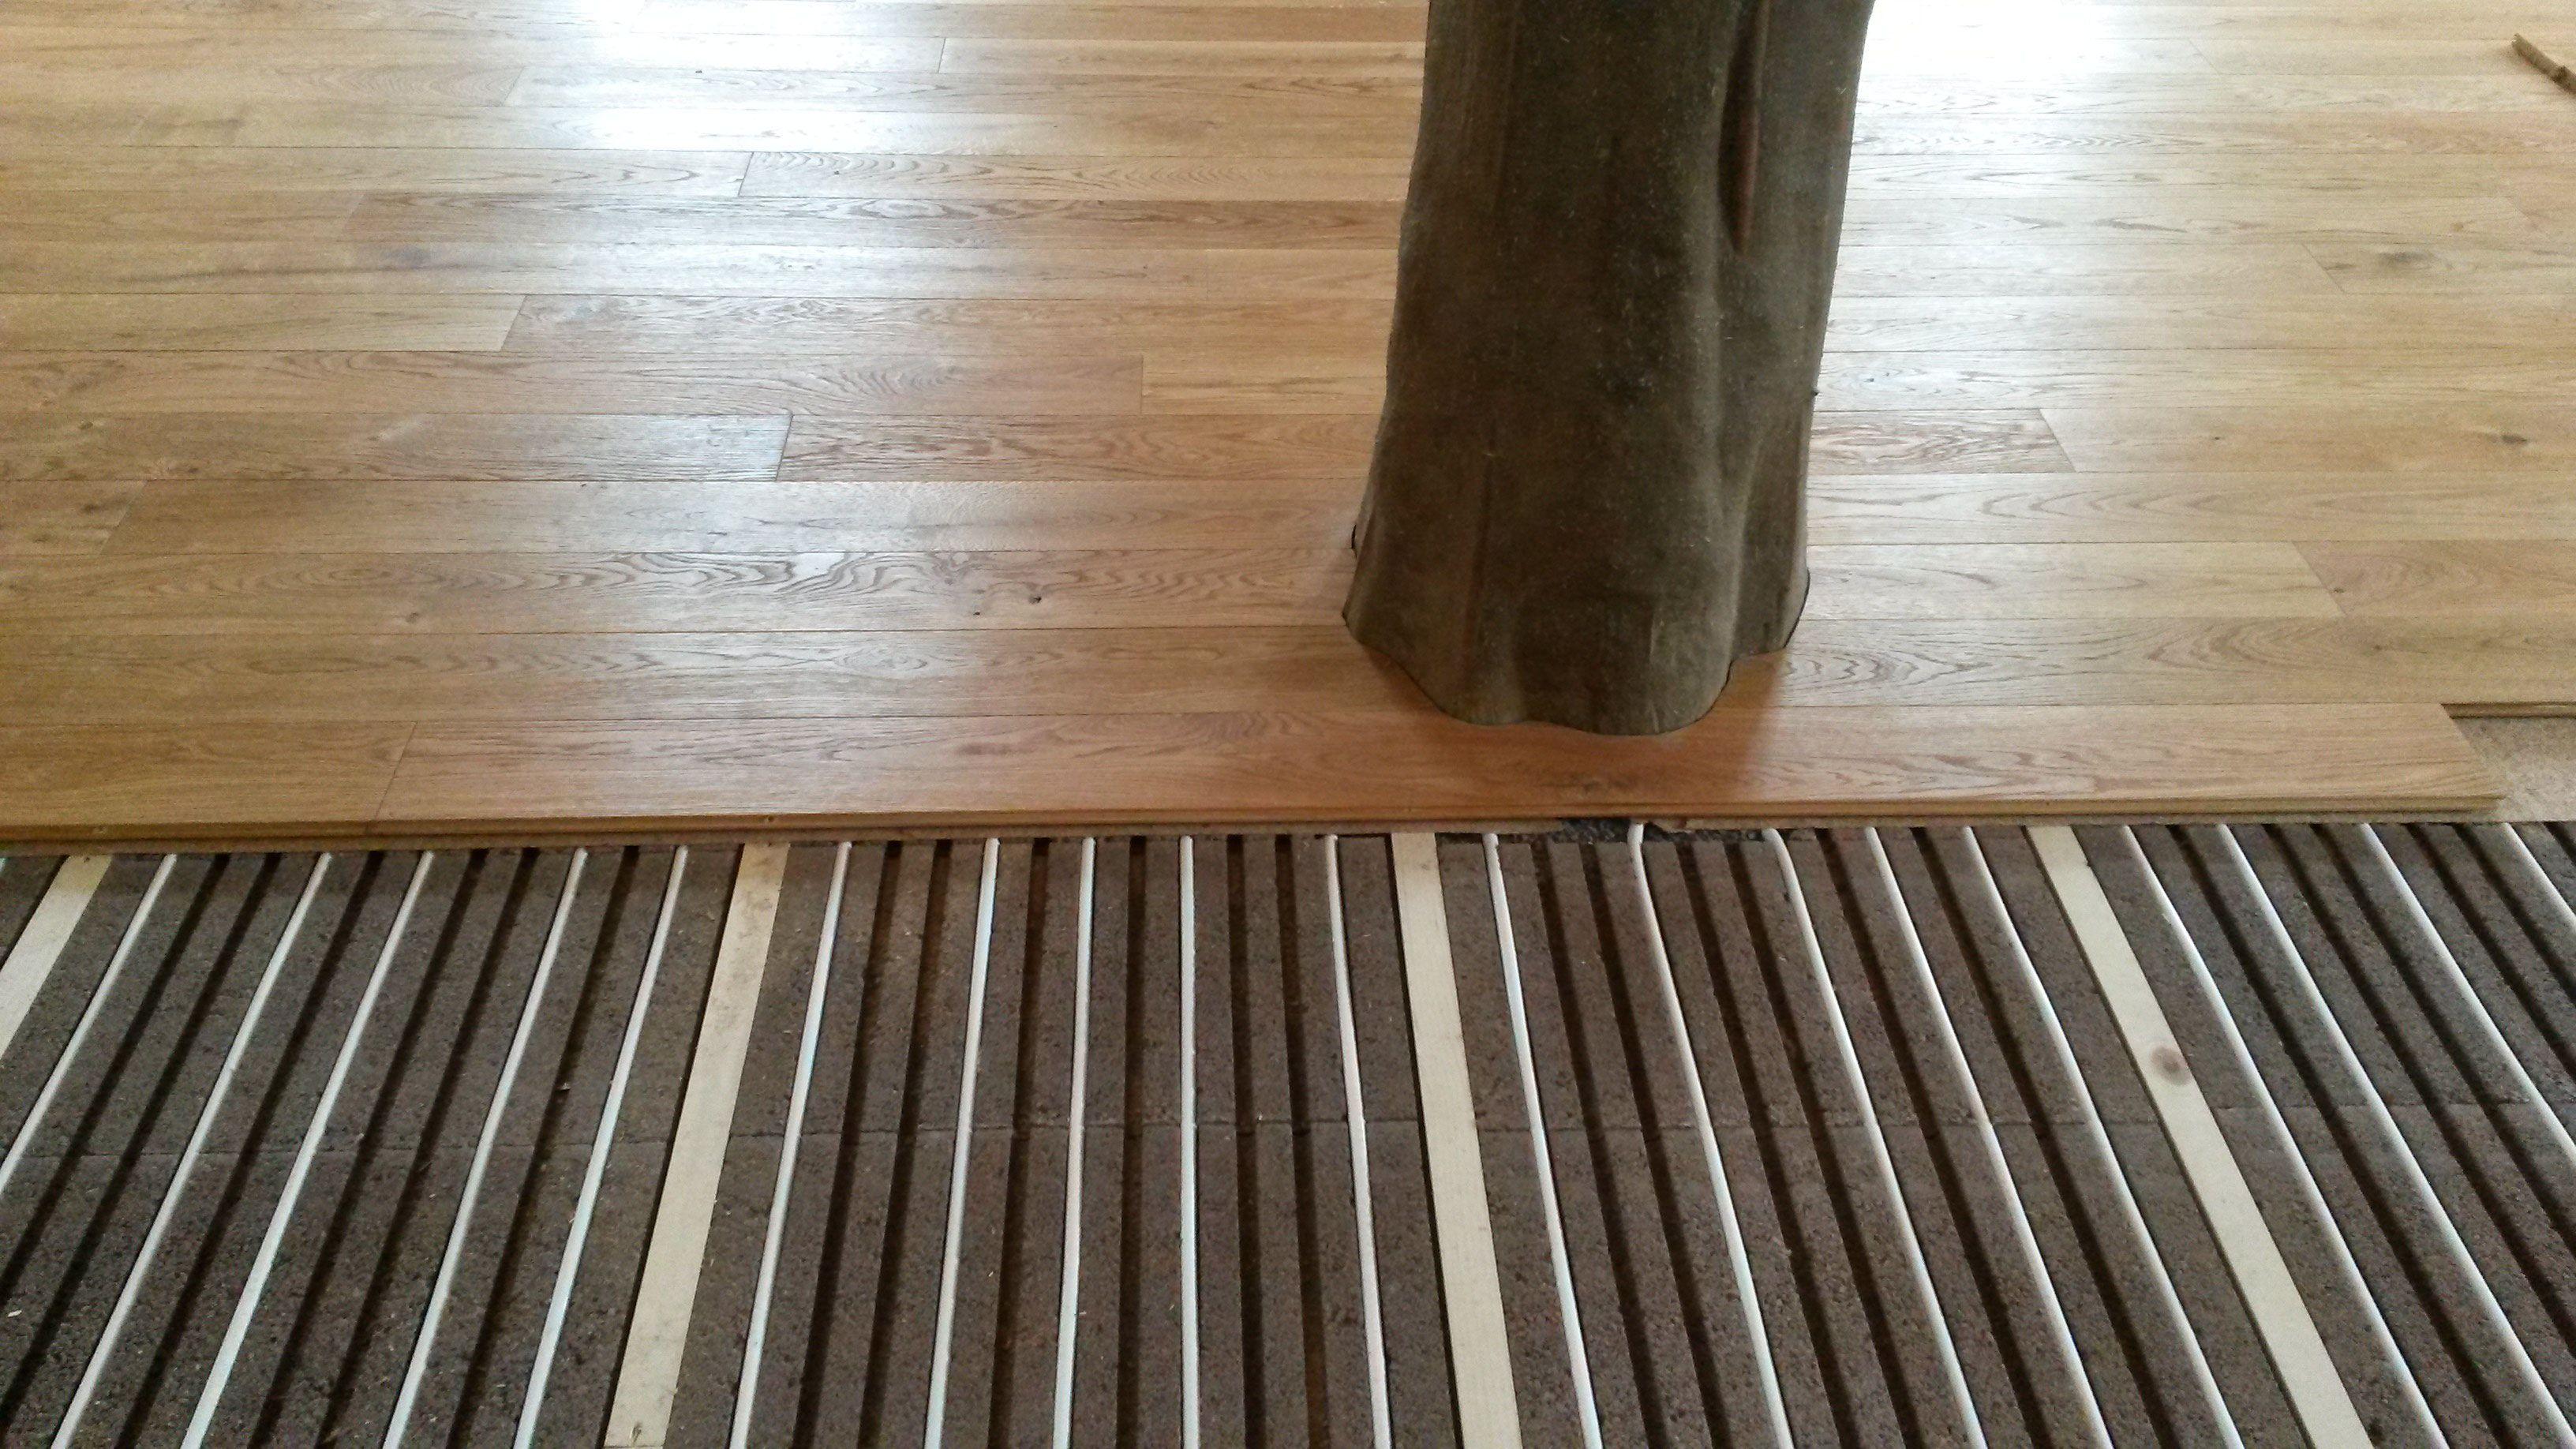 Fussbodenheizung Mit Komplett Trockenem Bodenaufbau Wir Klaren Auf Fussboden Fussbodenheizung Holzboden